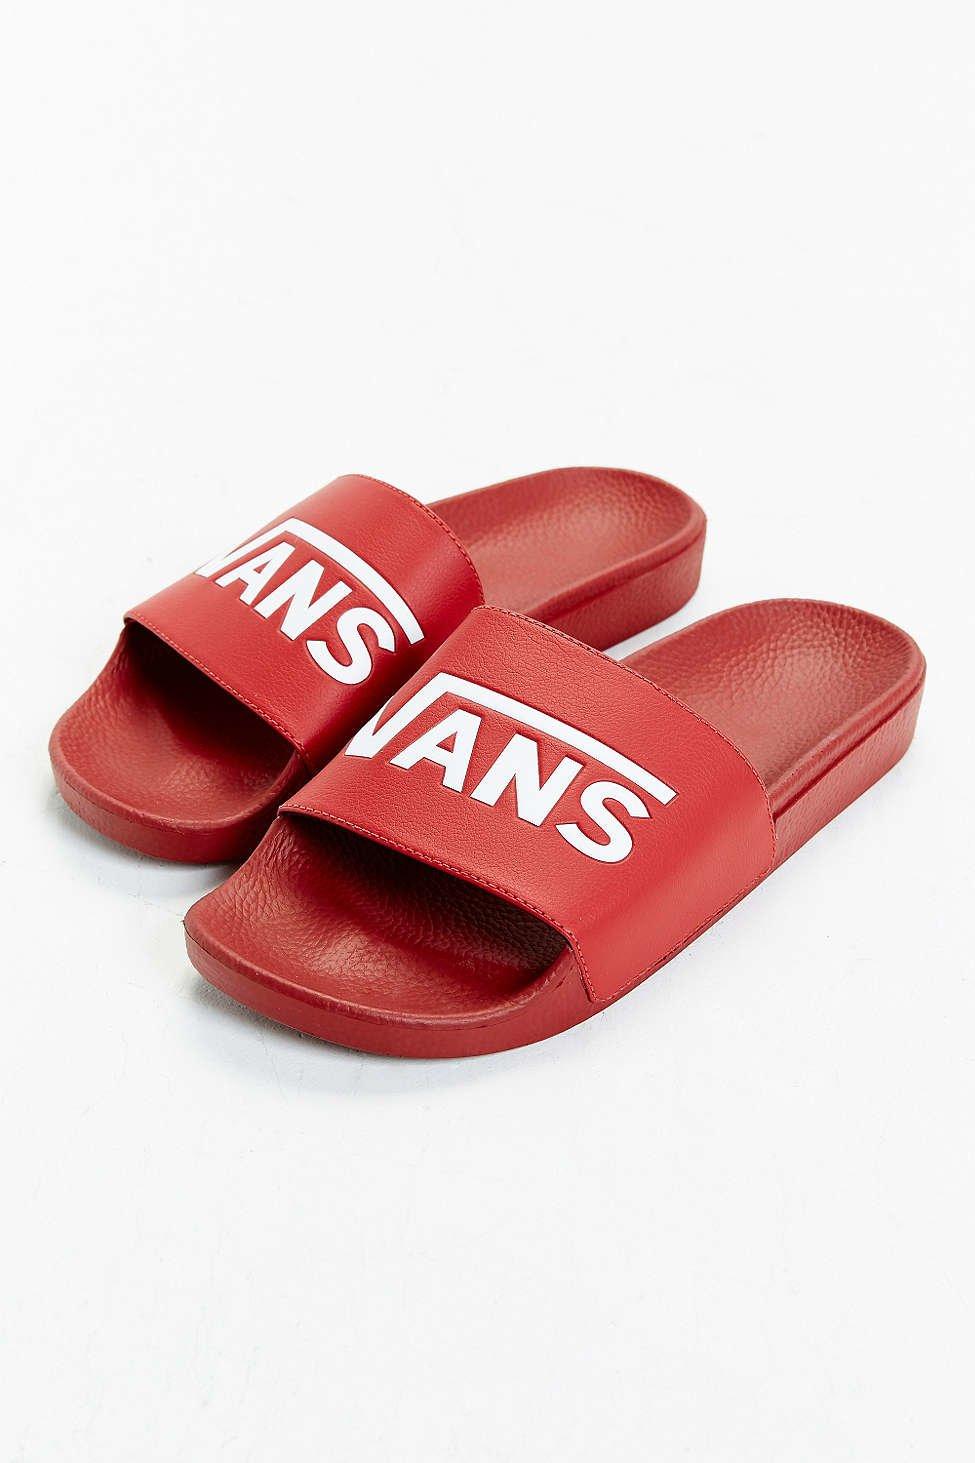 buy \u003e vans red sandals, Up to 69% OFF